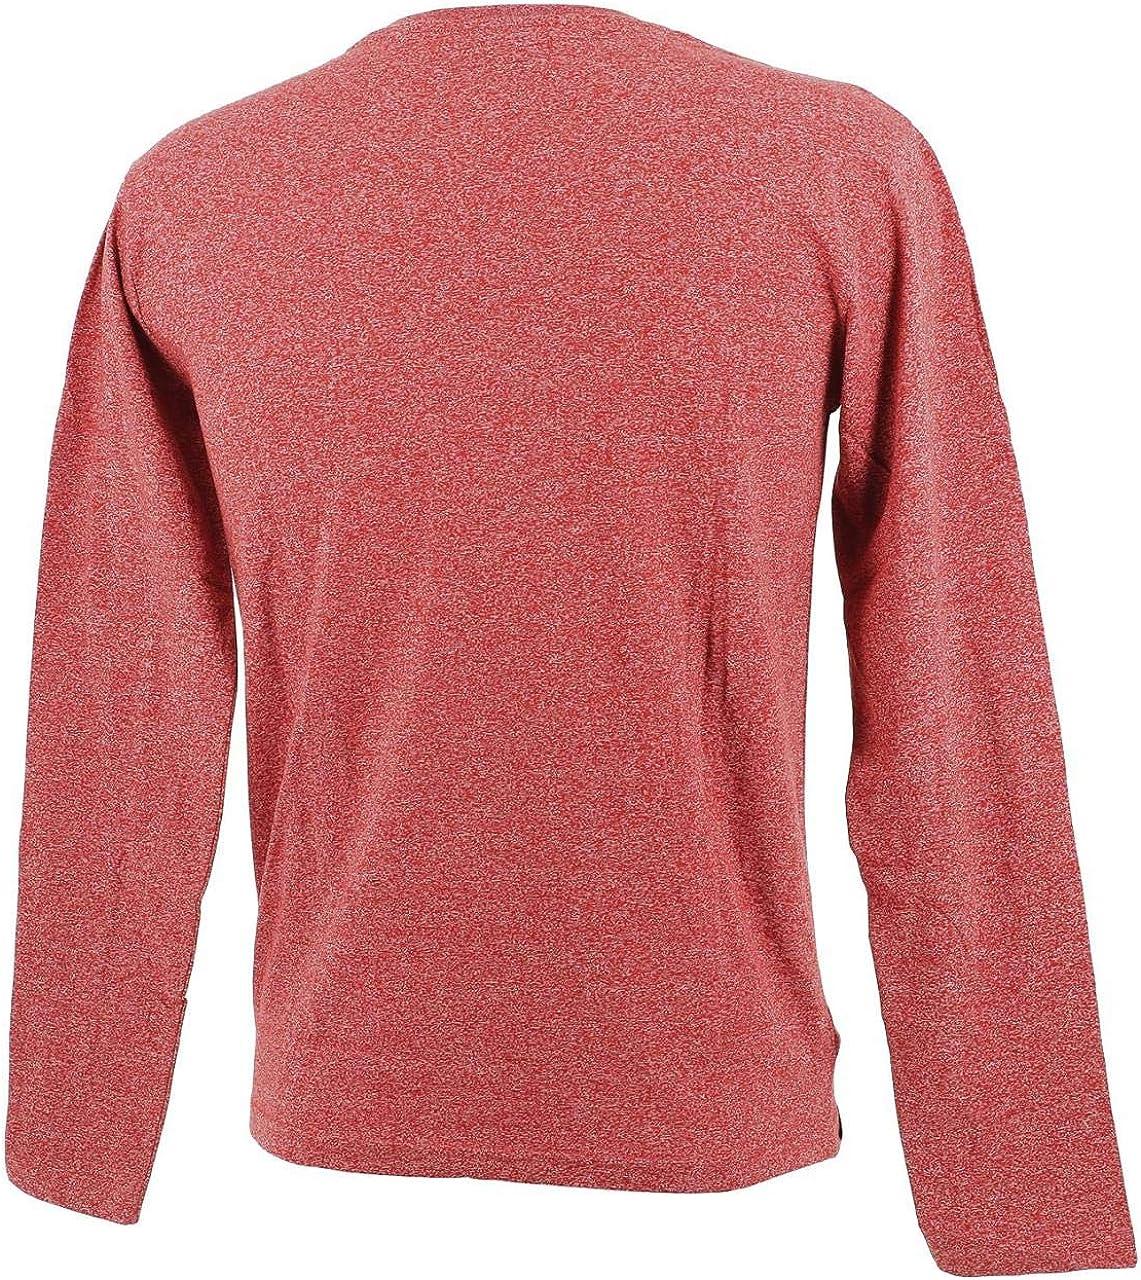 Tee Shirt Manches Longues Kaporal 5 Mower Burnt Mel ML Tee jr